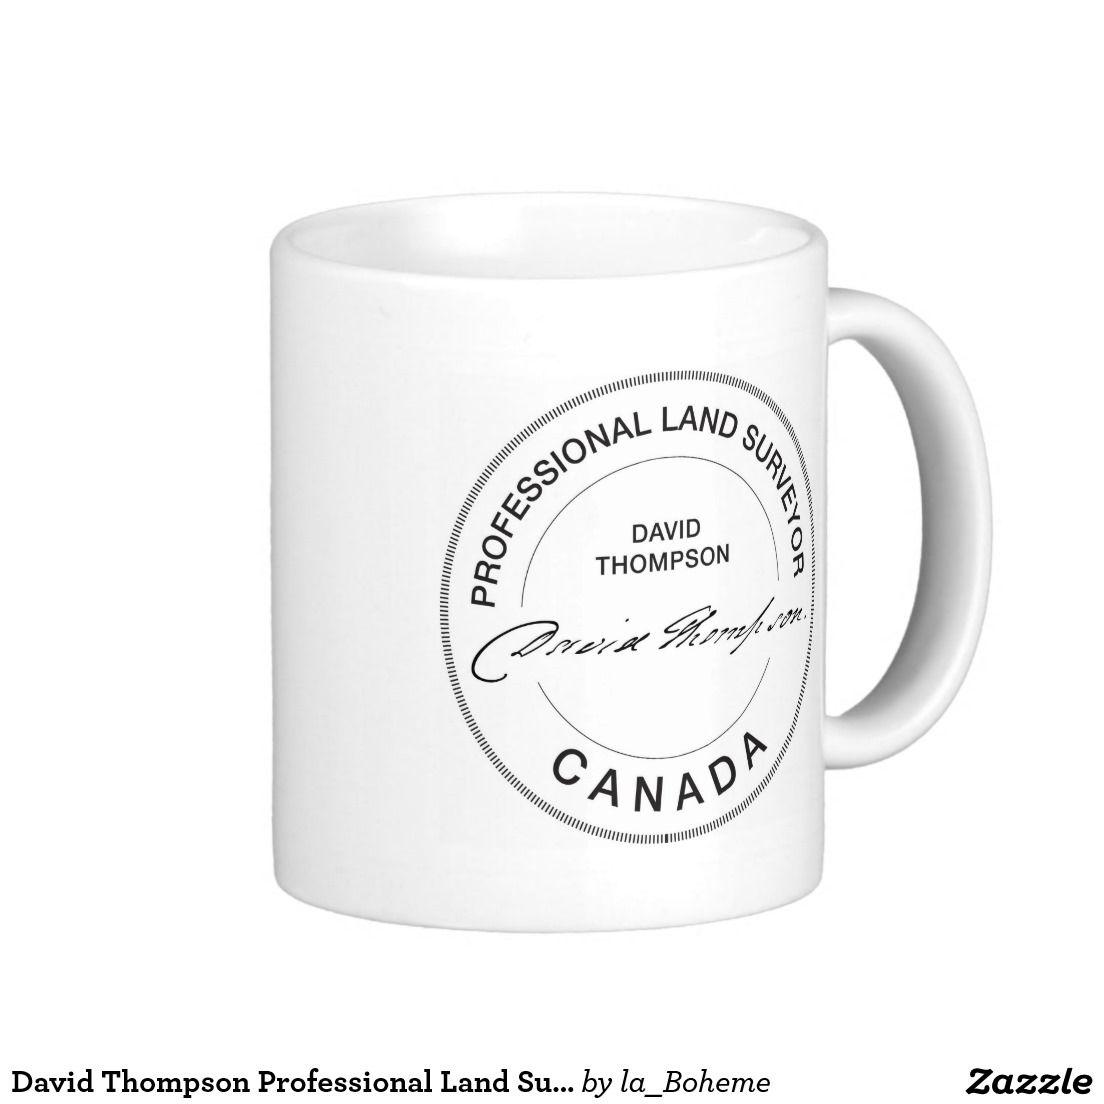 David Thompson Professional Land Surveyor Canada Classic